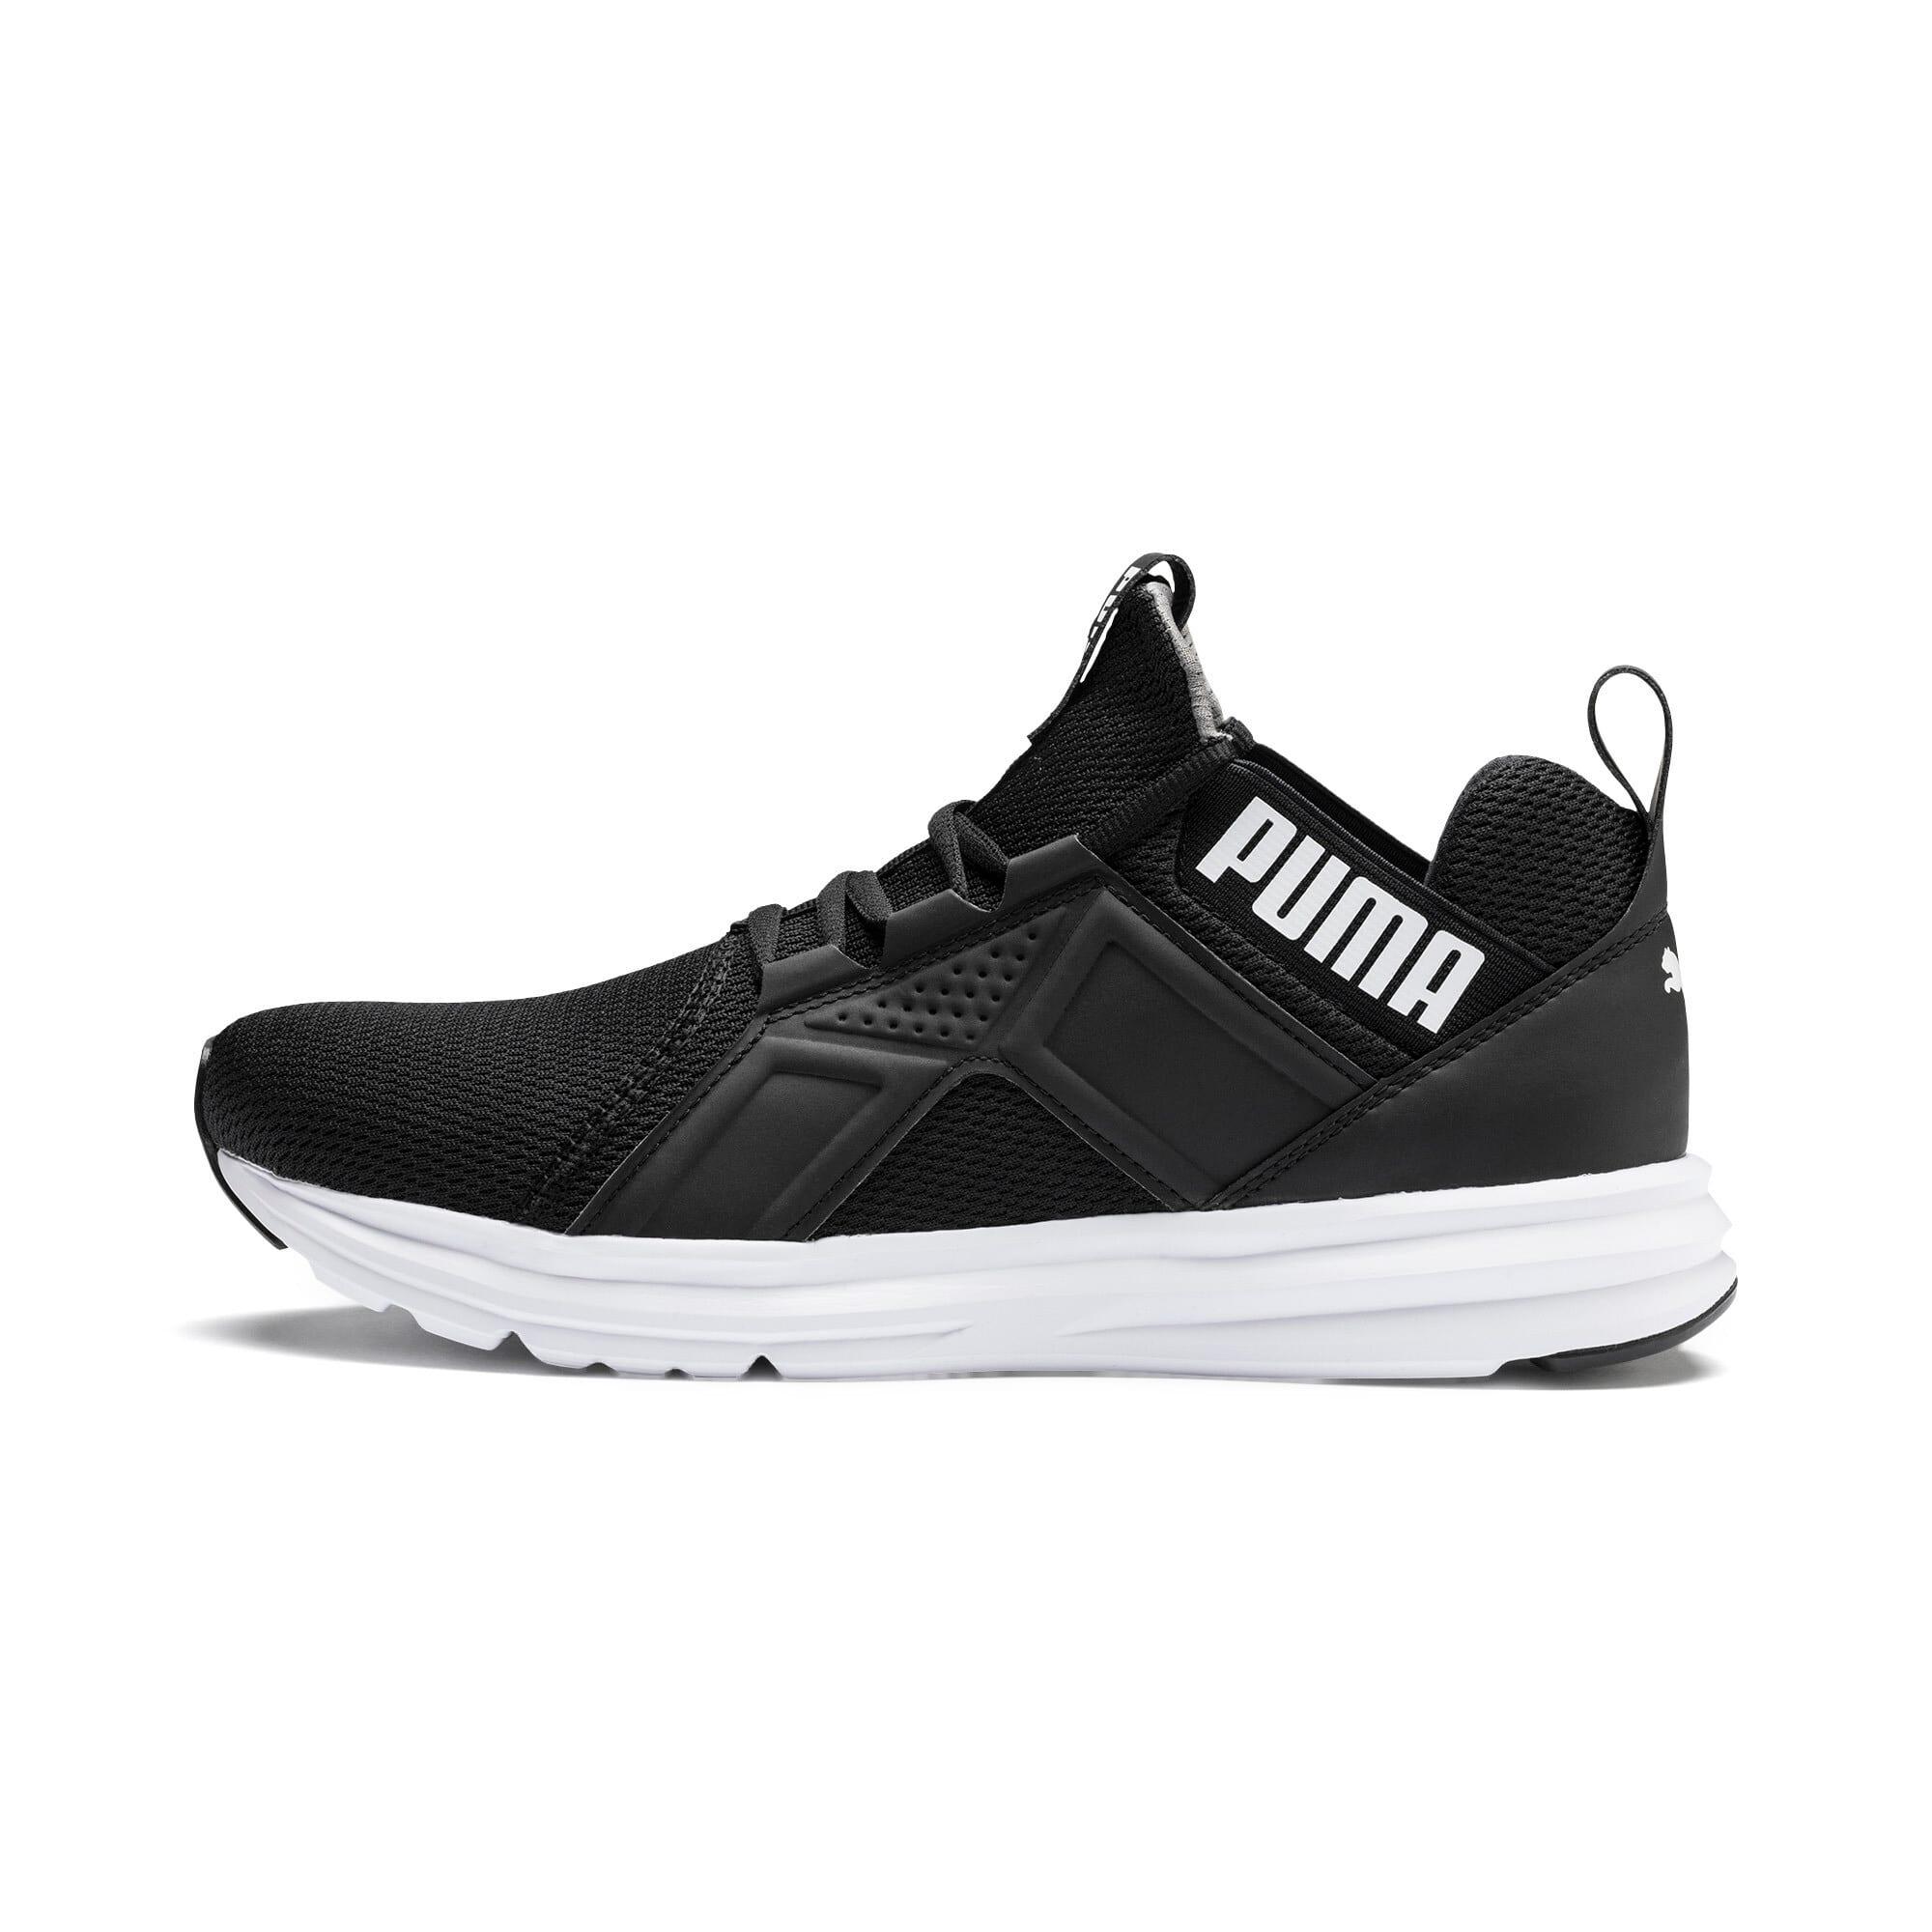 Thumbnail 1 of Enzo sportschoenen voor heren, Puma Black-Puma White, medium